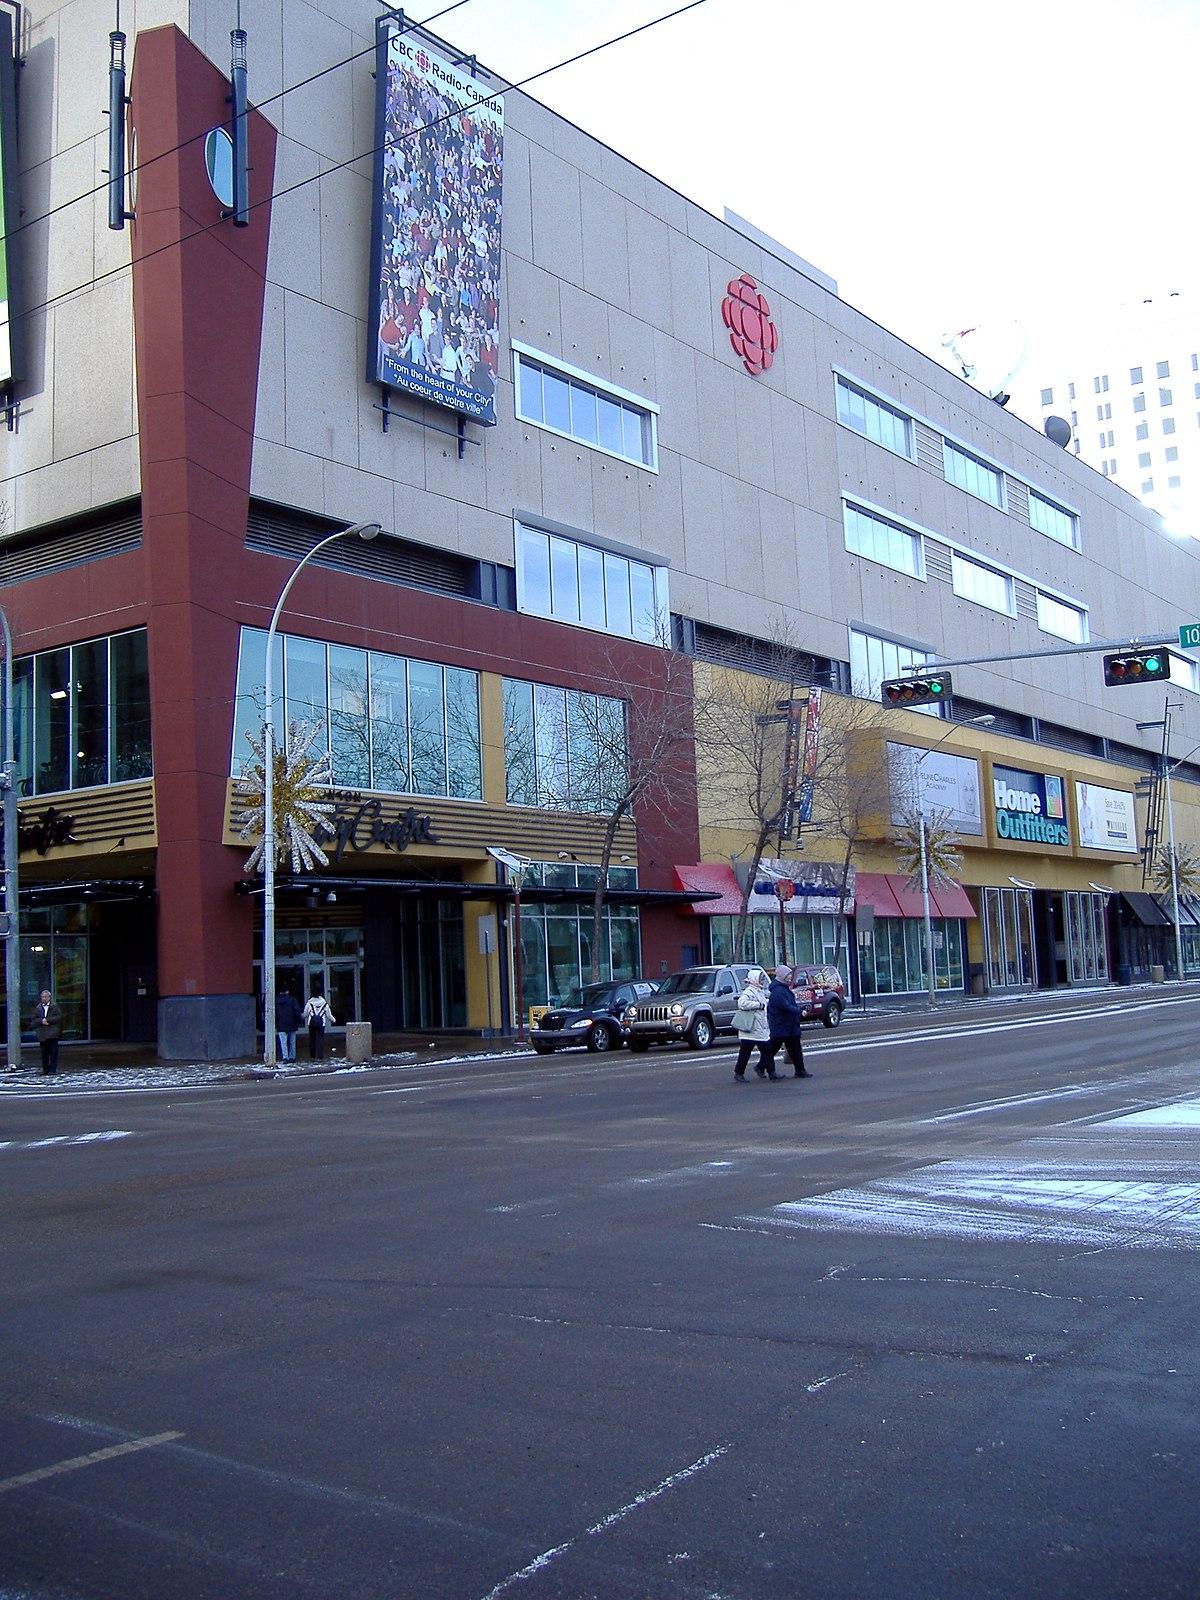 Edmonton: Edmonton City Centre